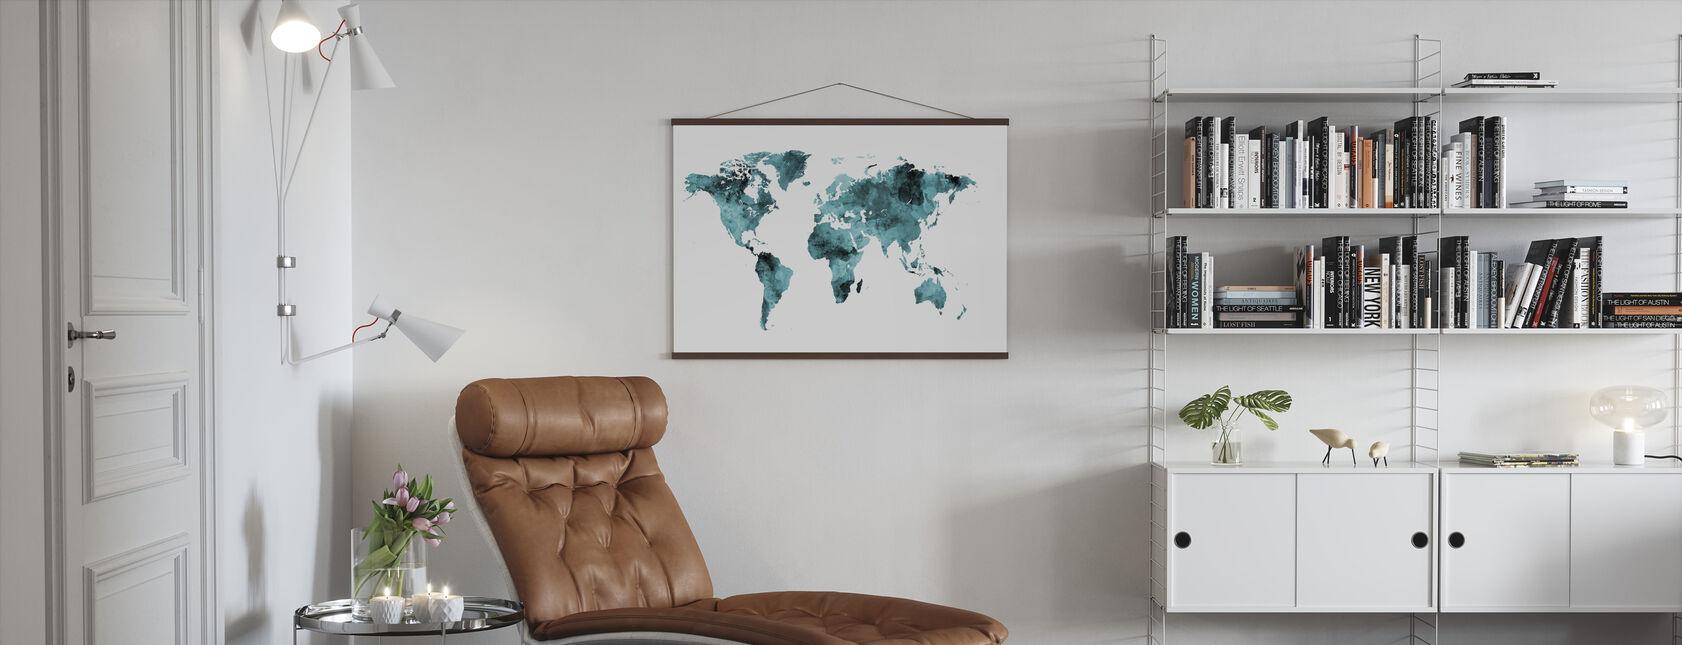 Aquarell Weltkarte Türkis - Poster - Wohnzimmer